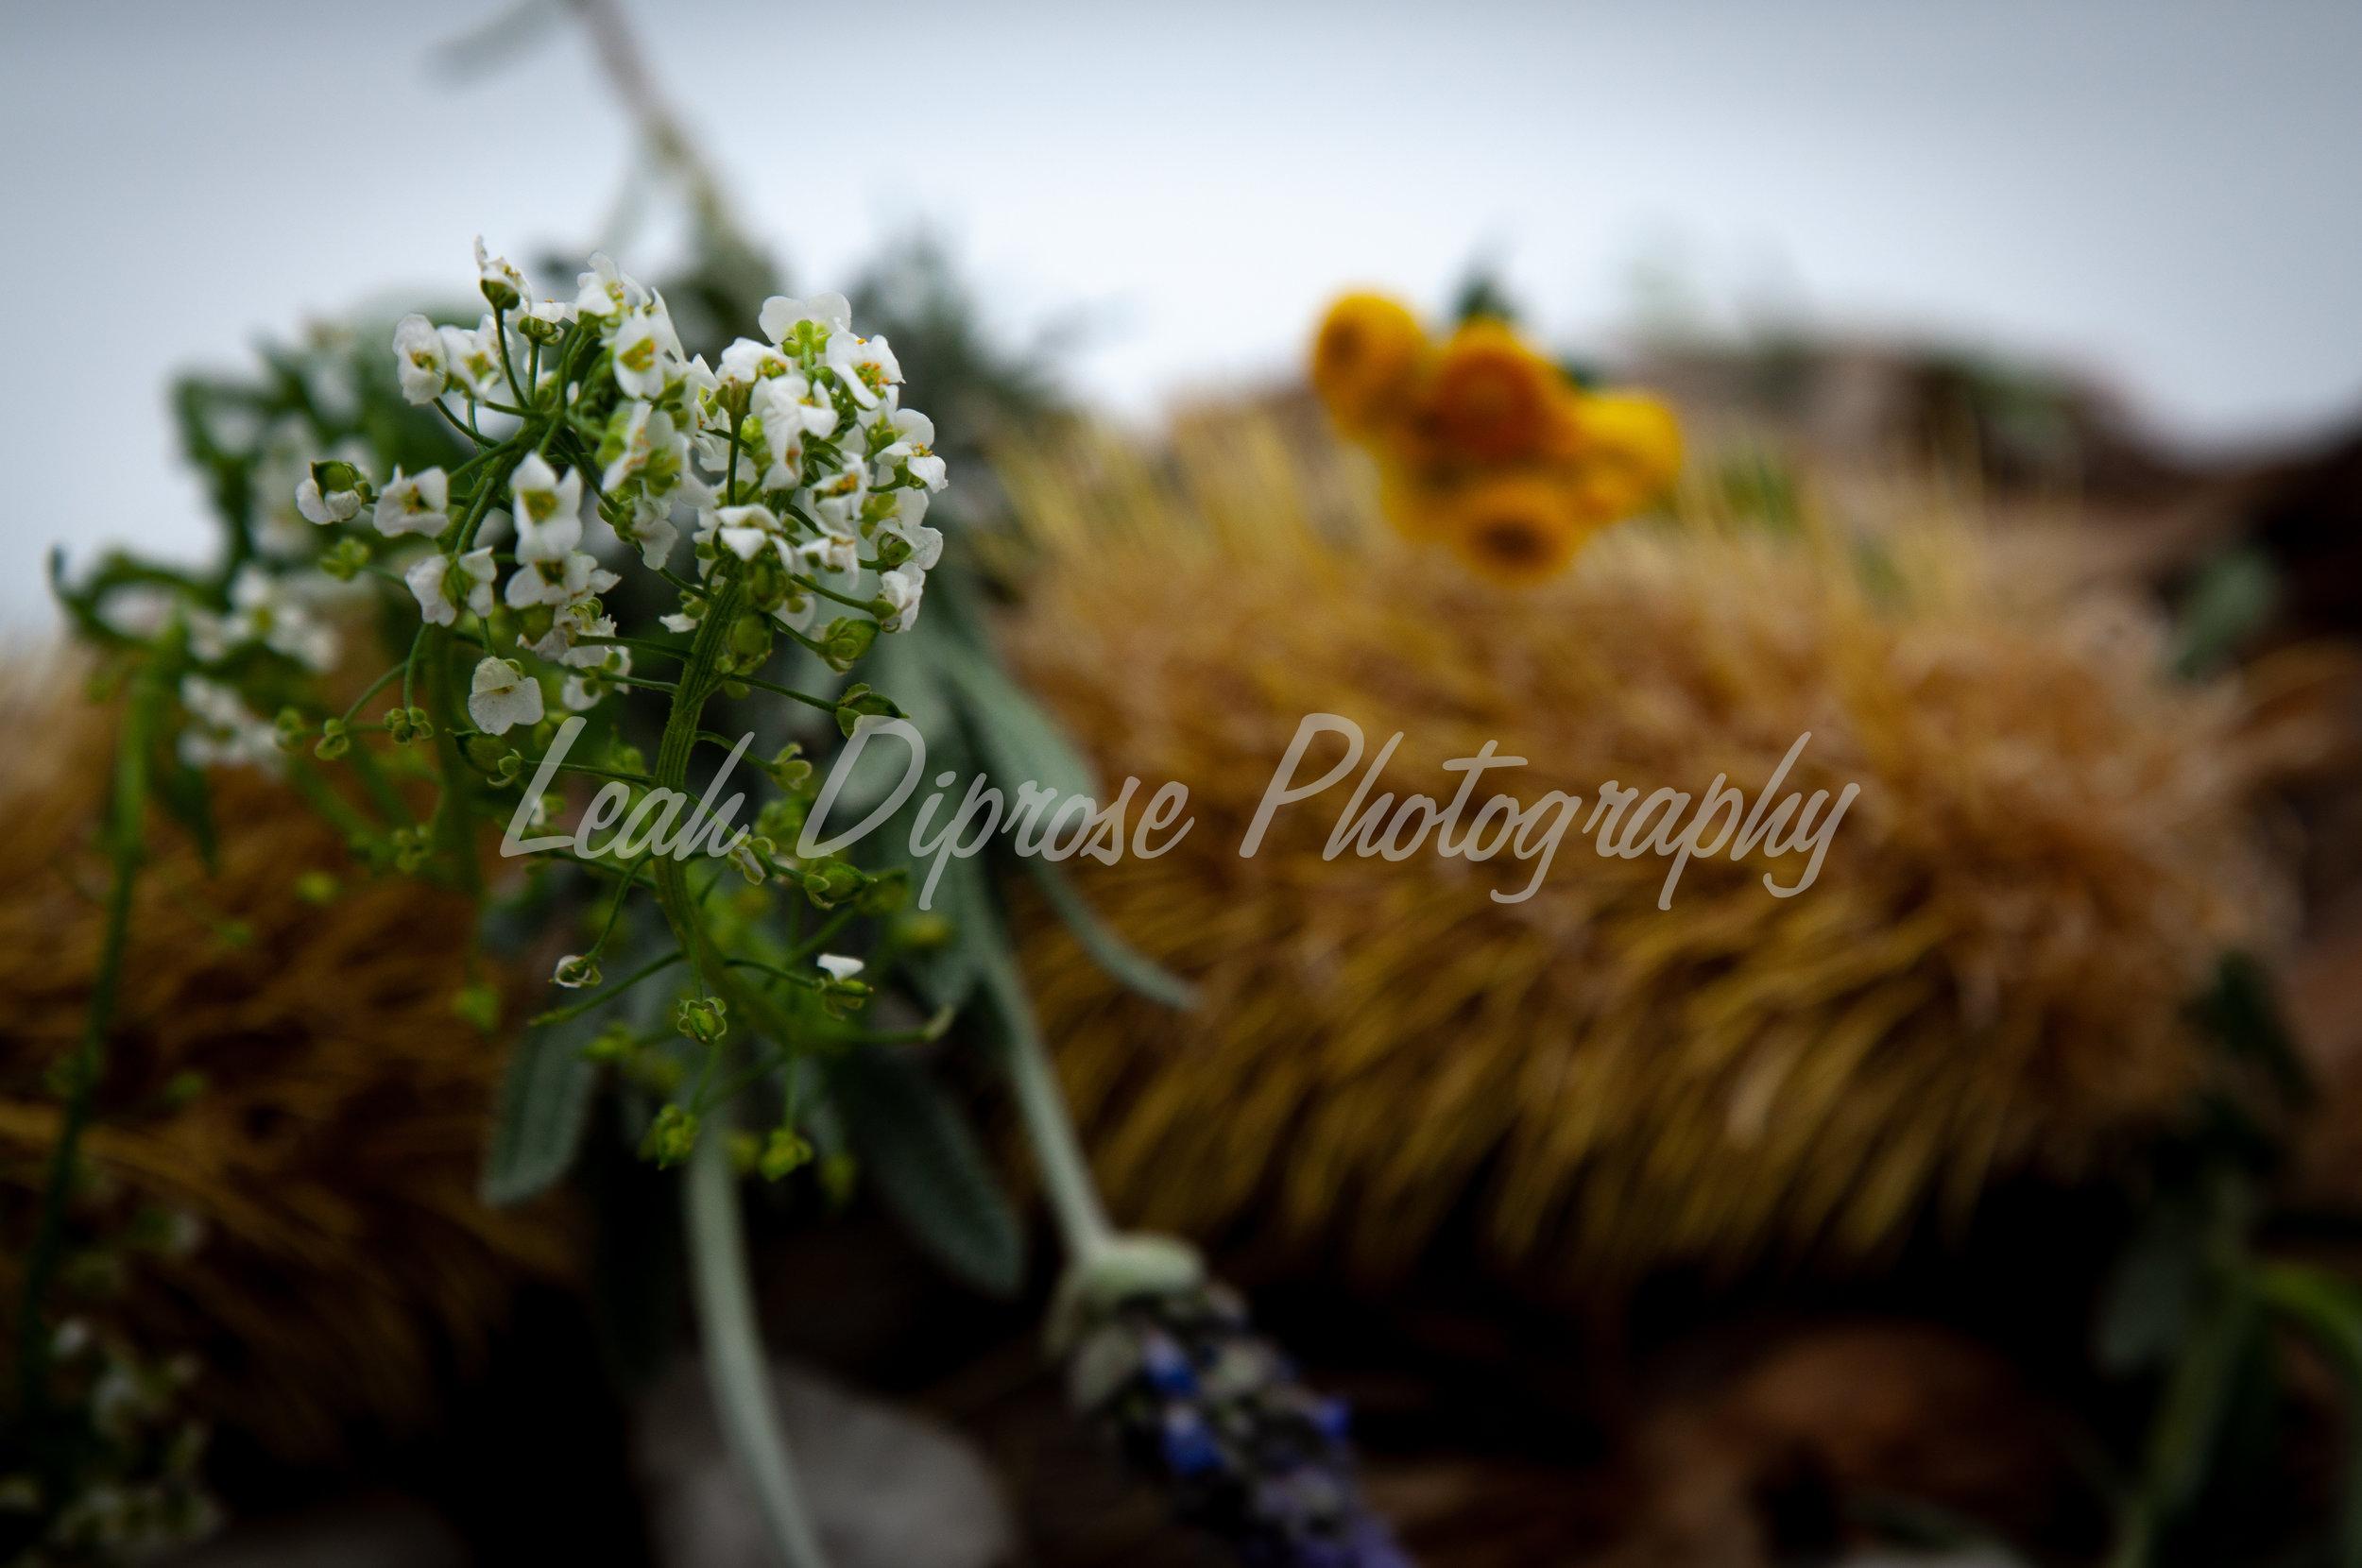 Leah Diprose Photography image-1593.jpg